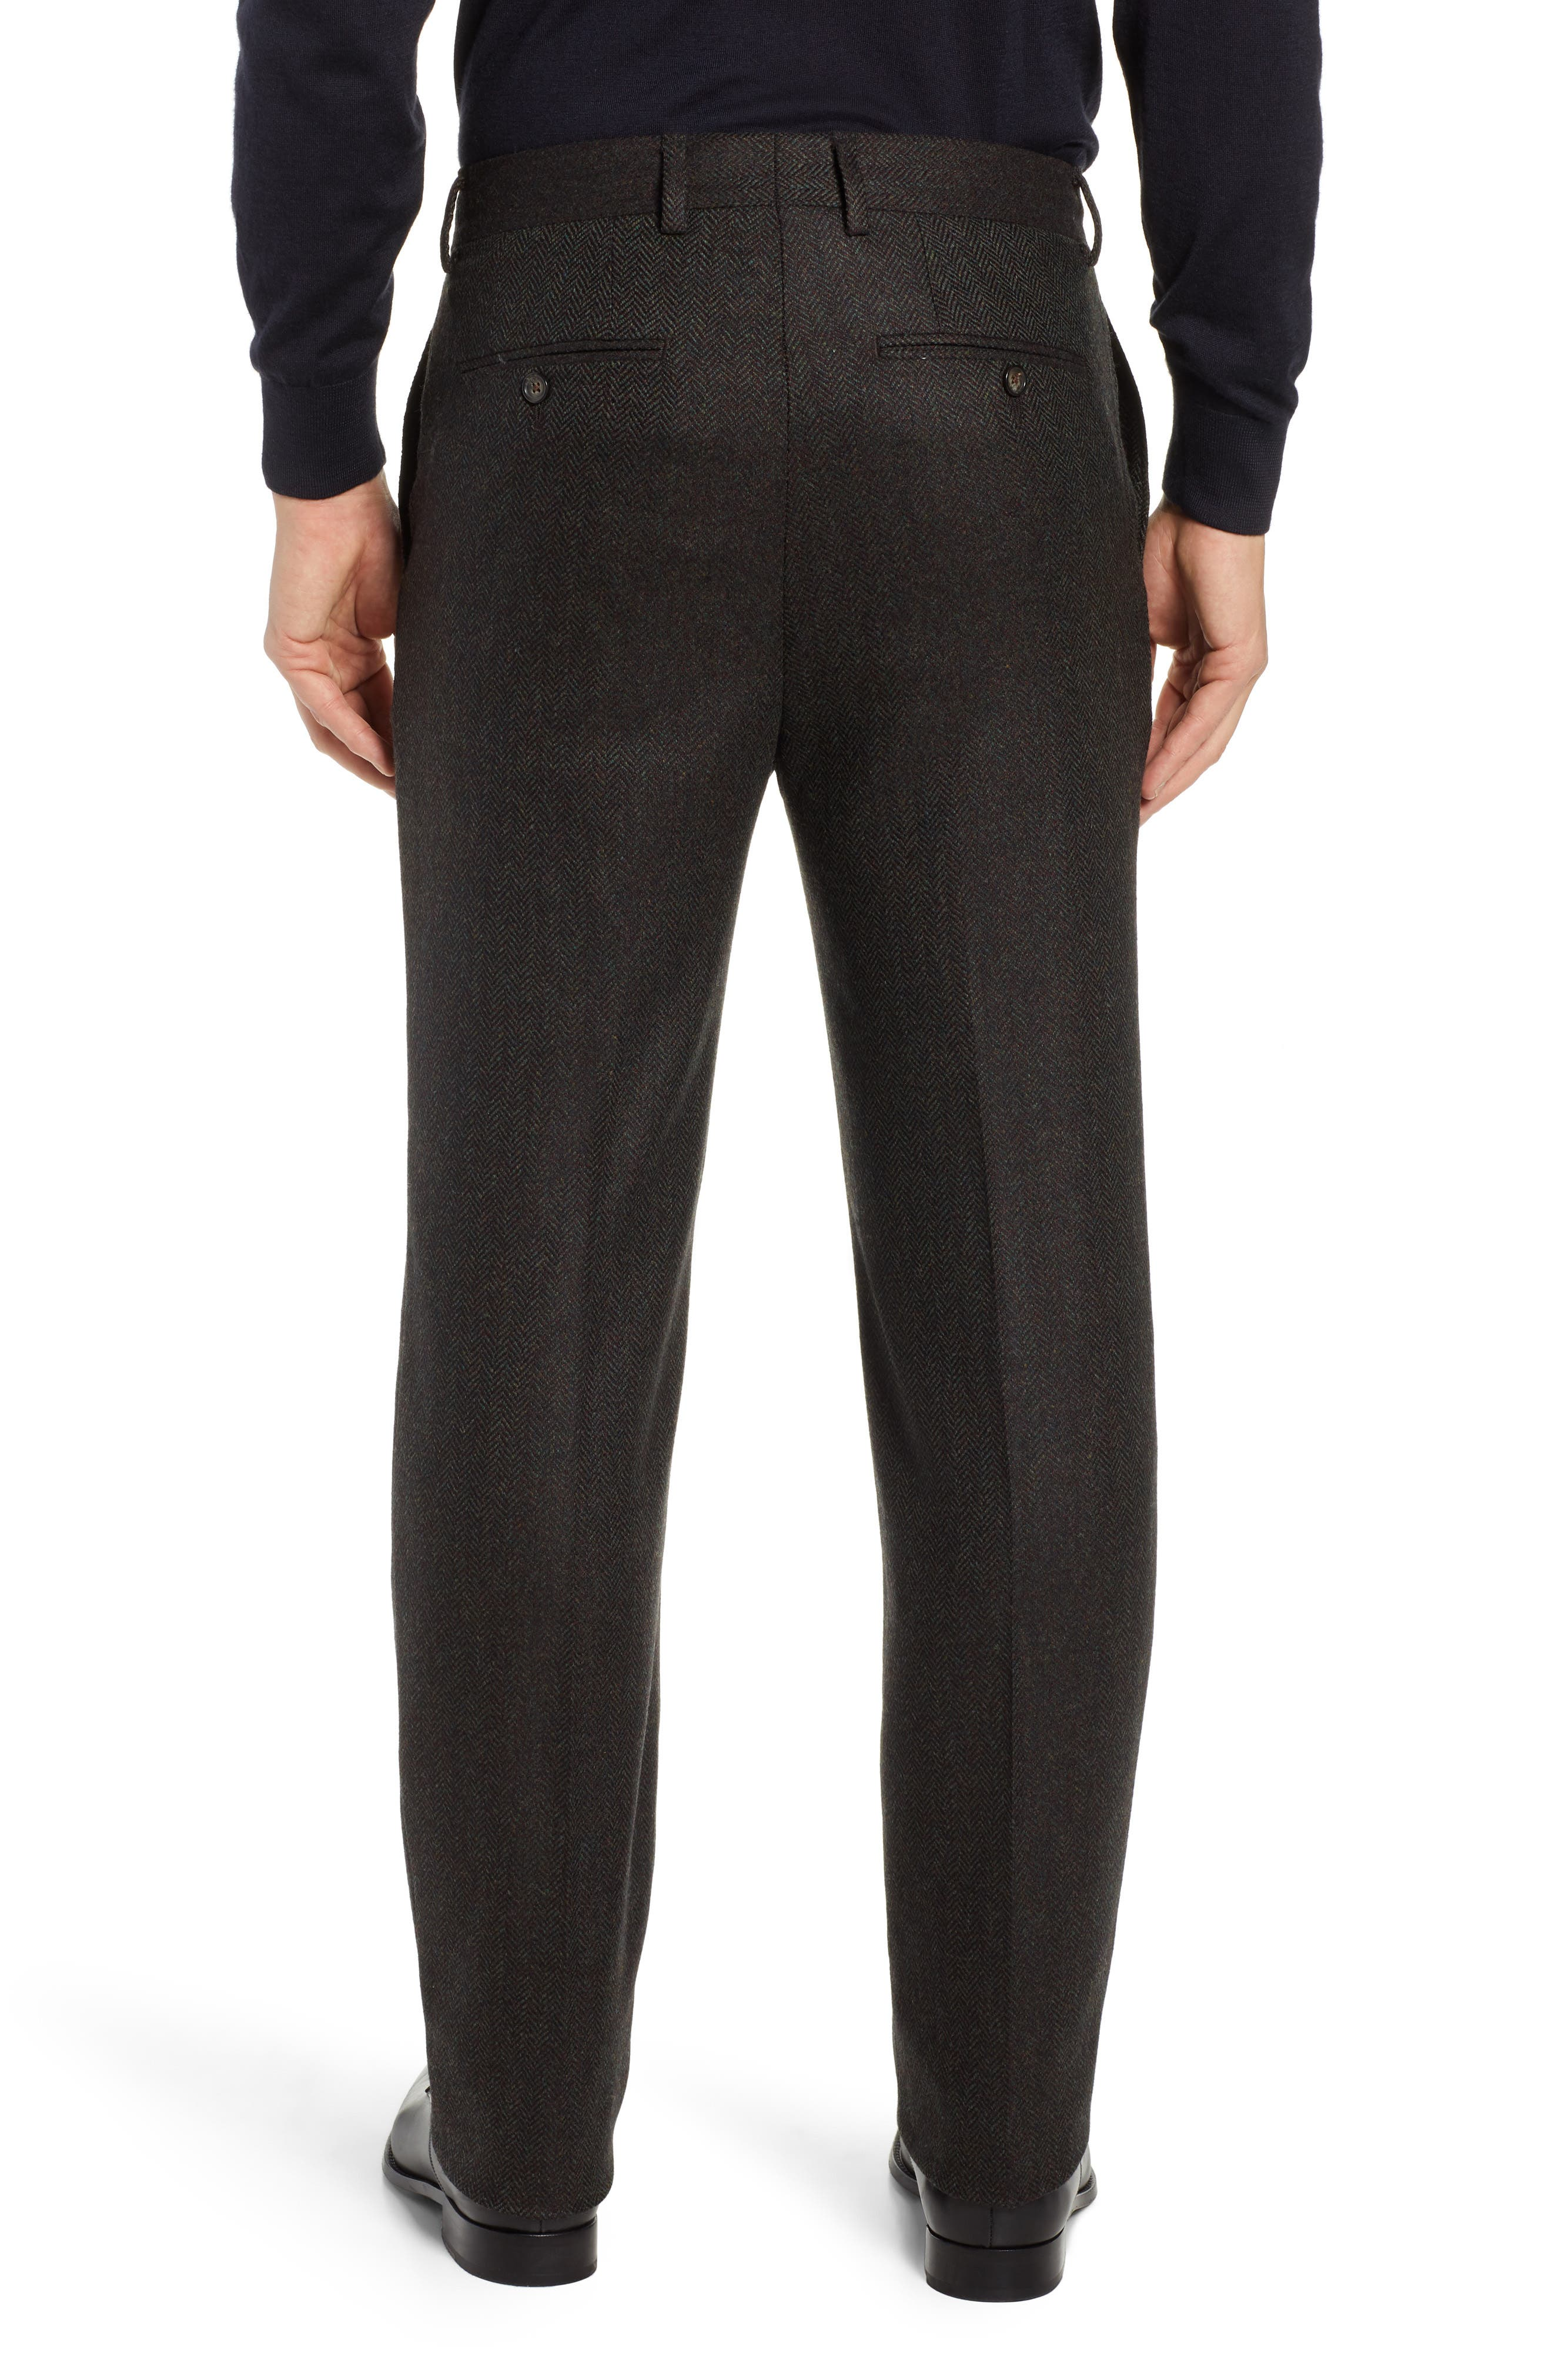 Flat Front Herringbone Wool & Cashmere Trousers,                             Alternate thumbnail 2, color,                             DARK OLIVE